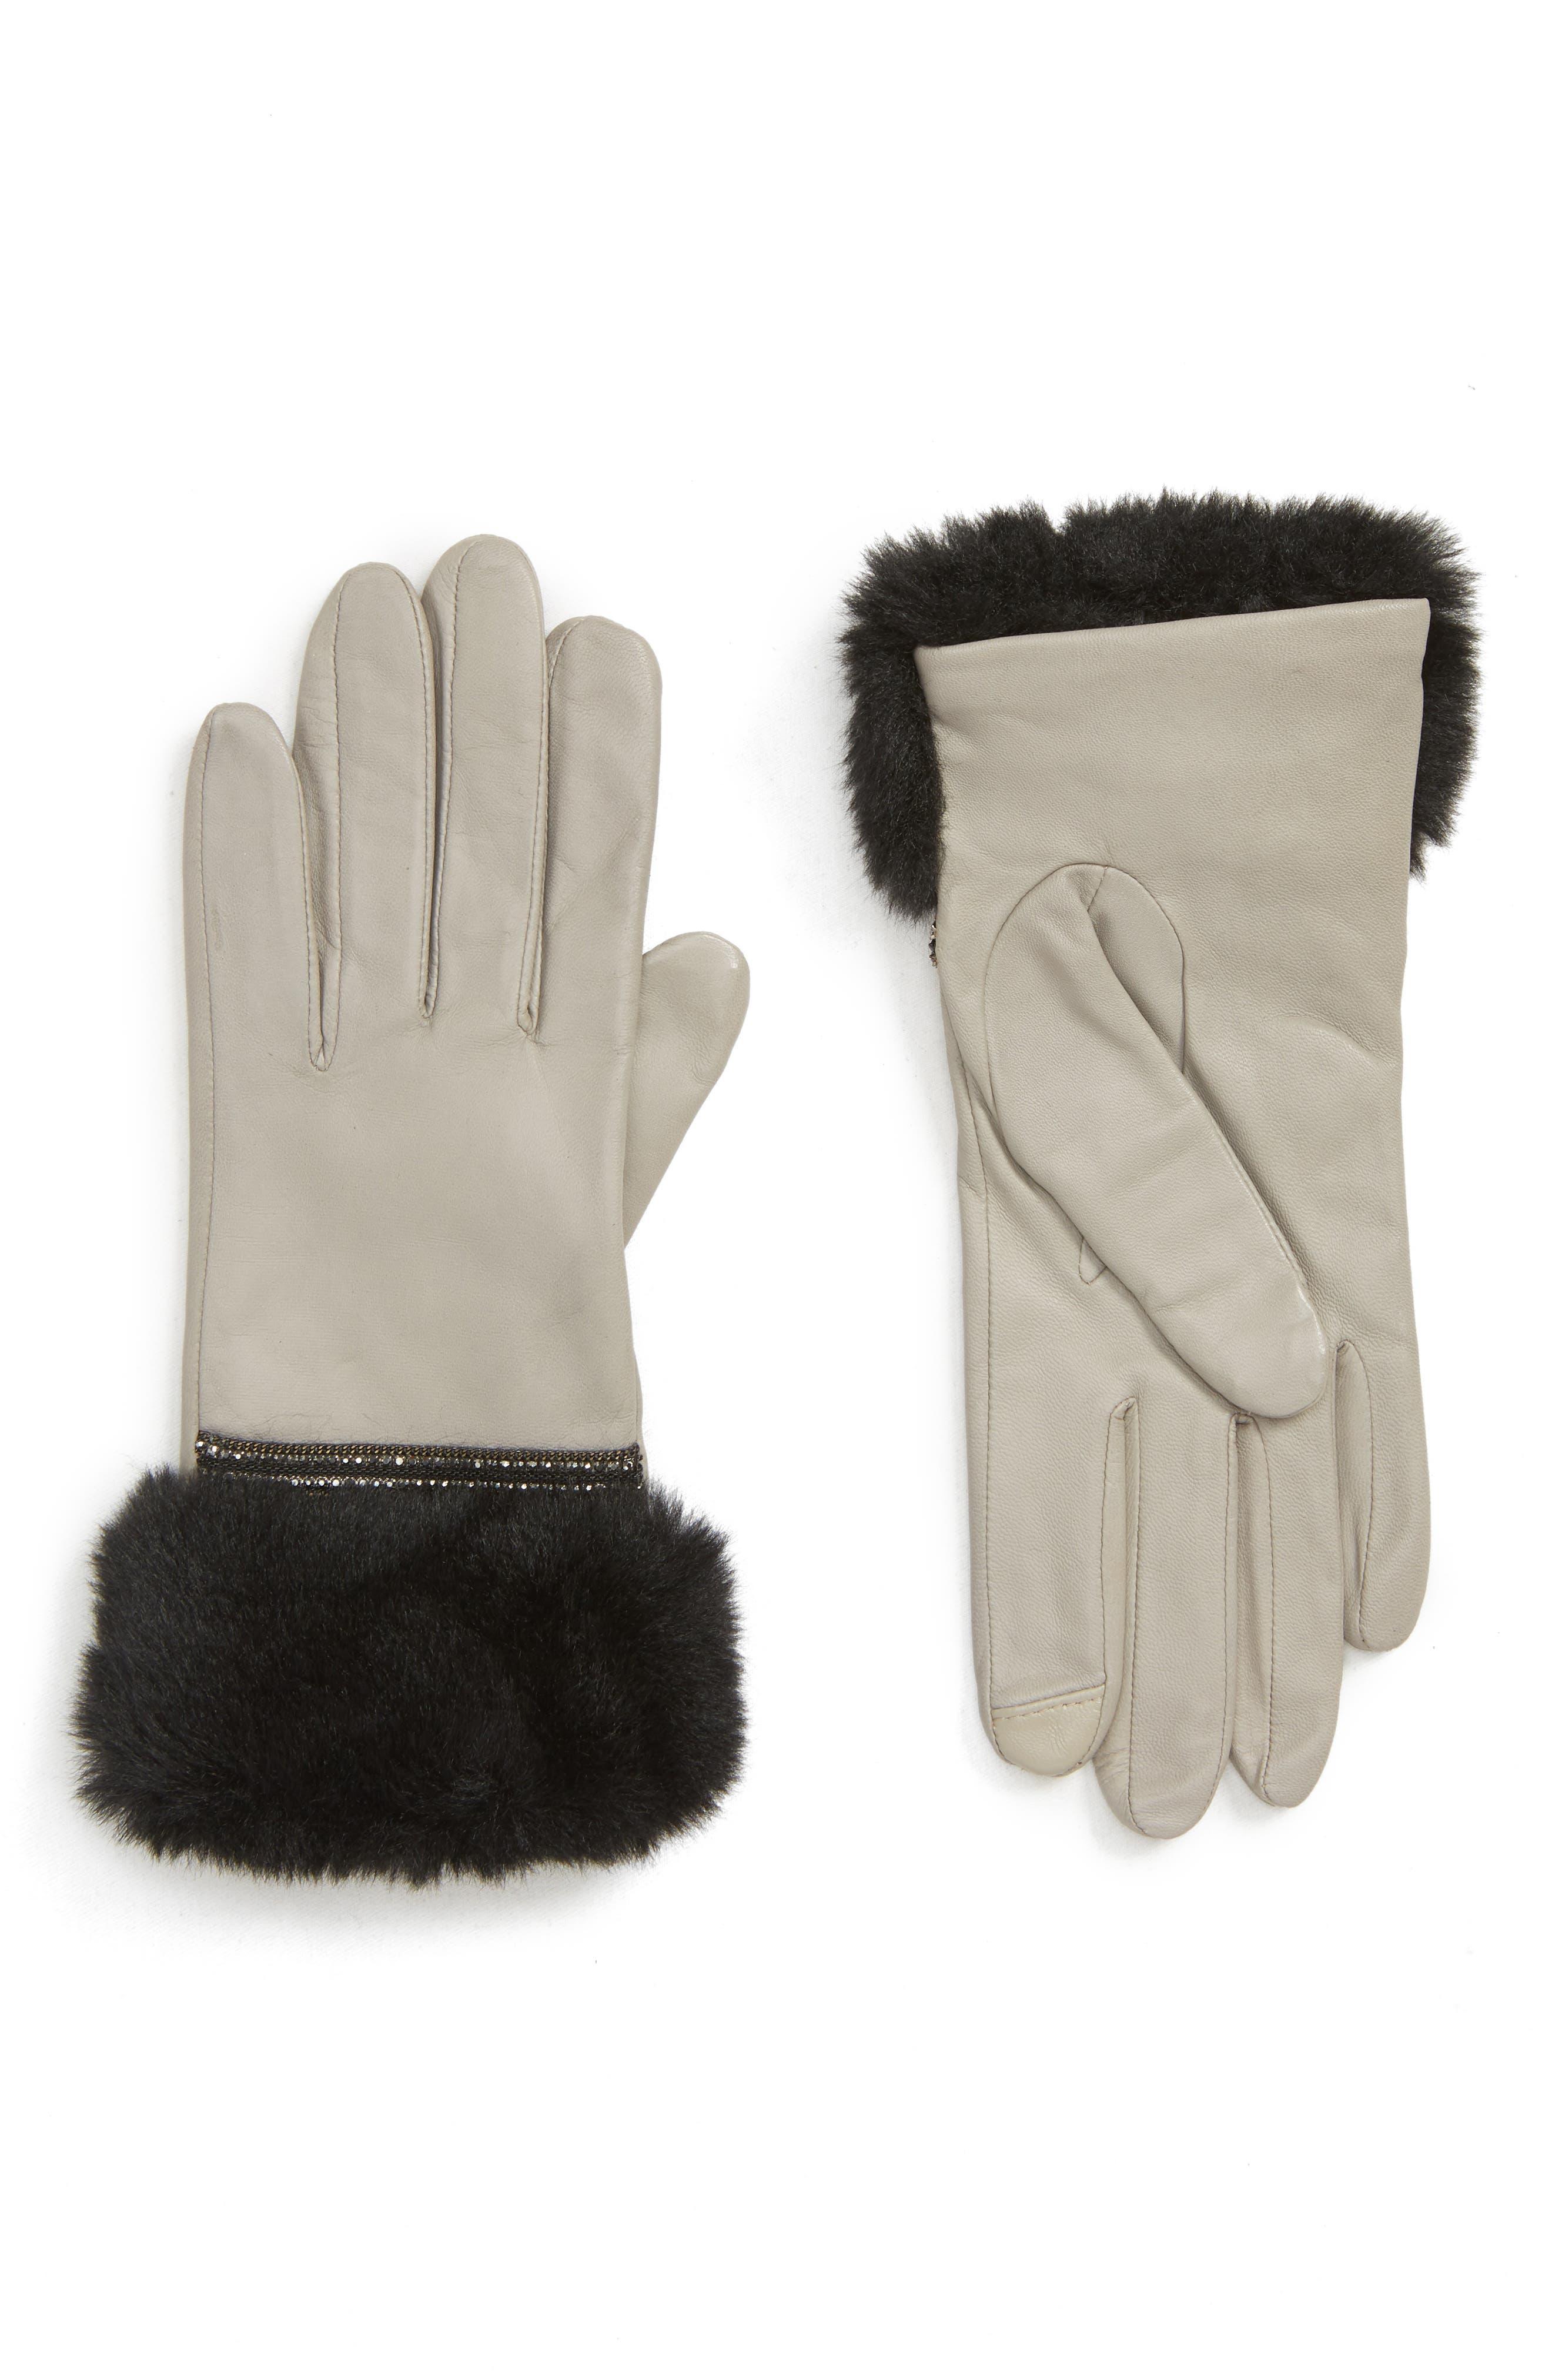 Badgley Mischka Faux Fur Trim Leather Touchscreen Gloves, Grey